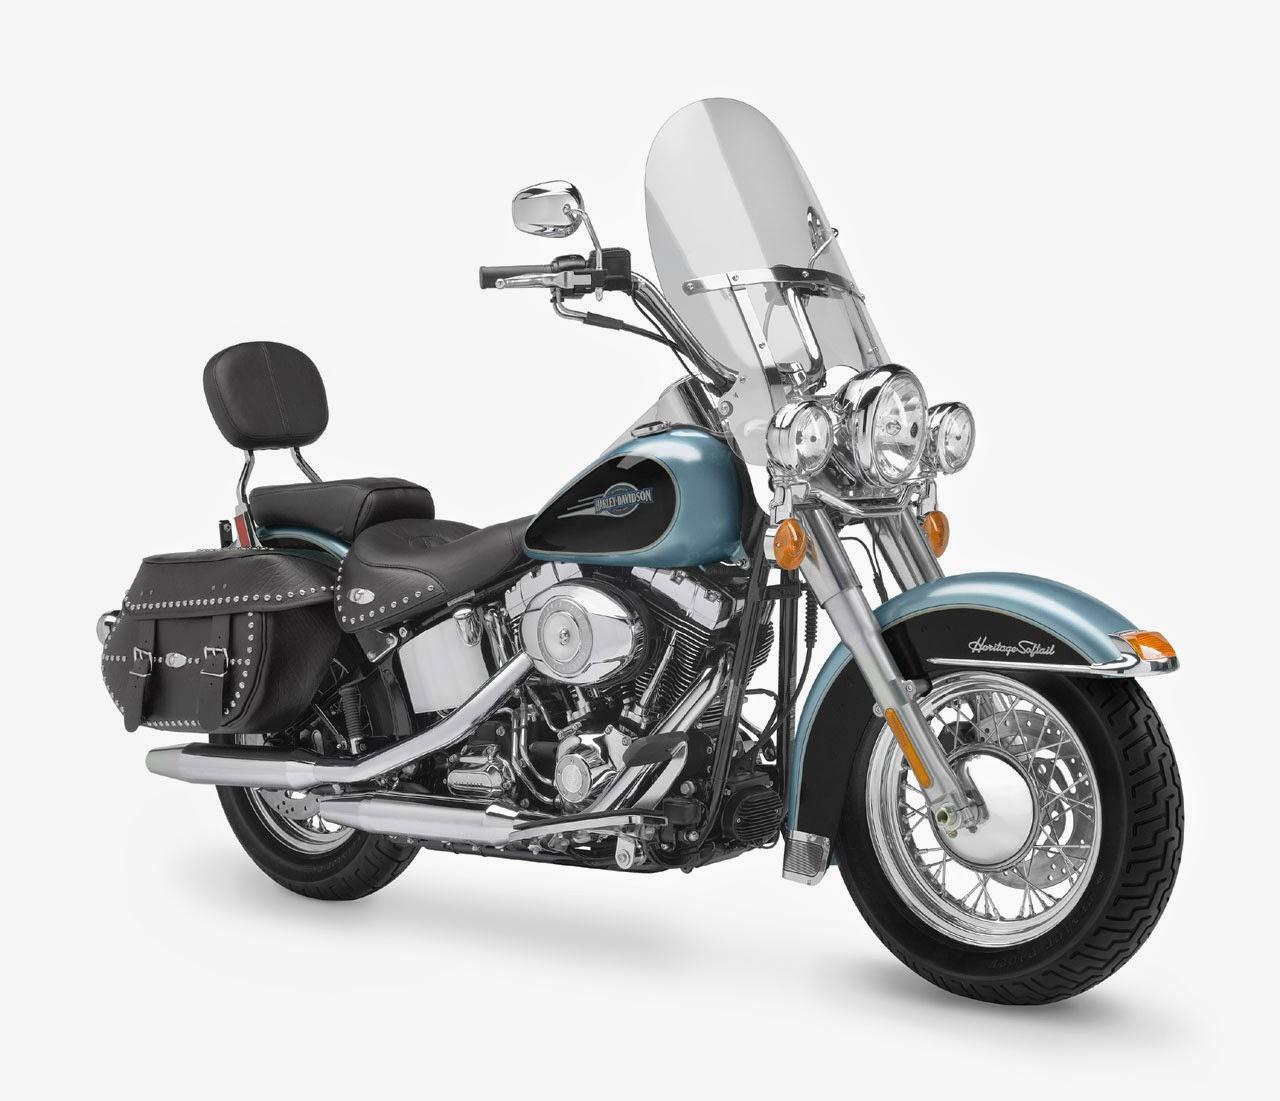 2004-2005 harley davidson softail motorcycle service manual.